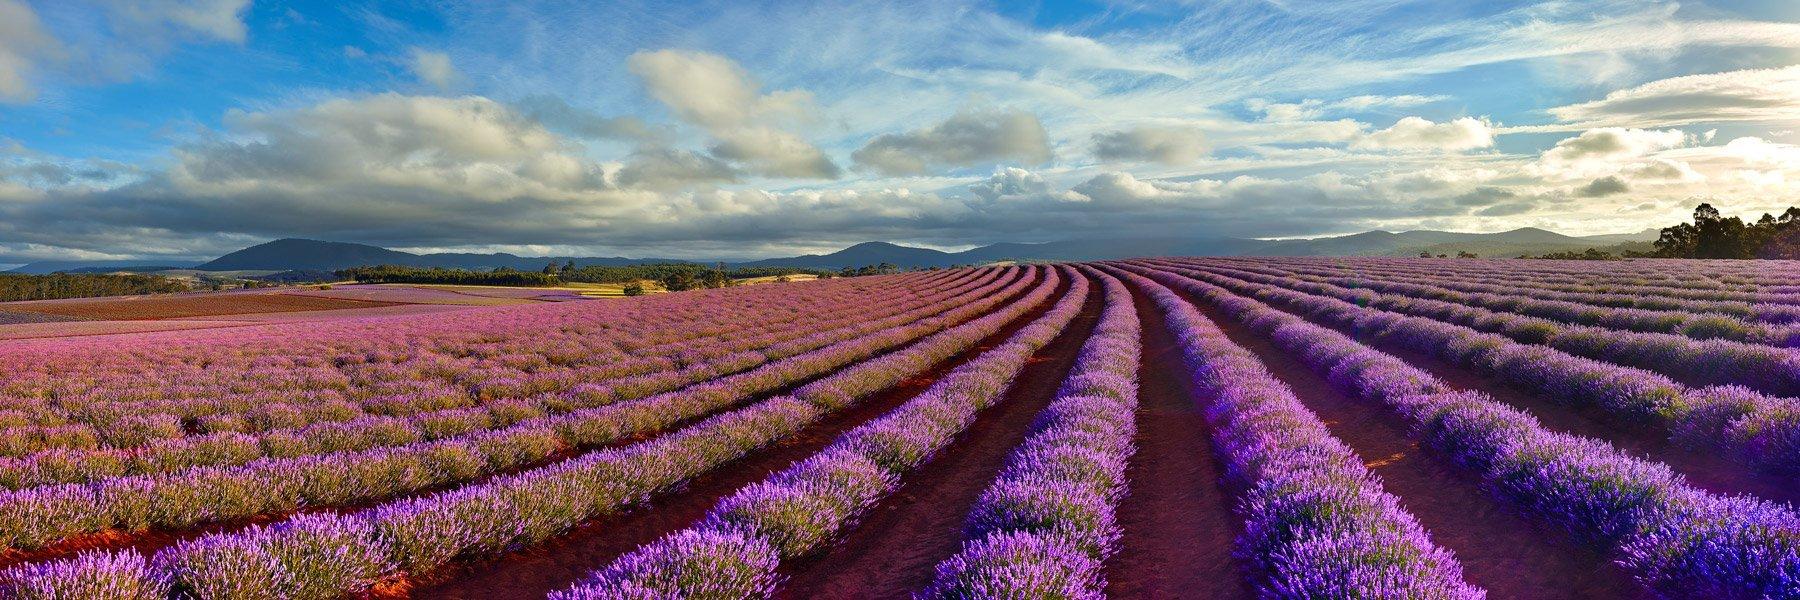 A glorious field of purple lavender in bloom, Tasmania, Australia.